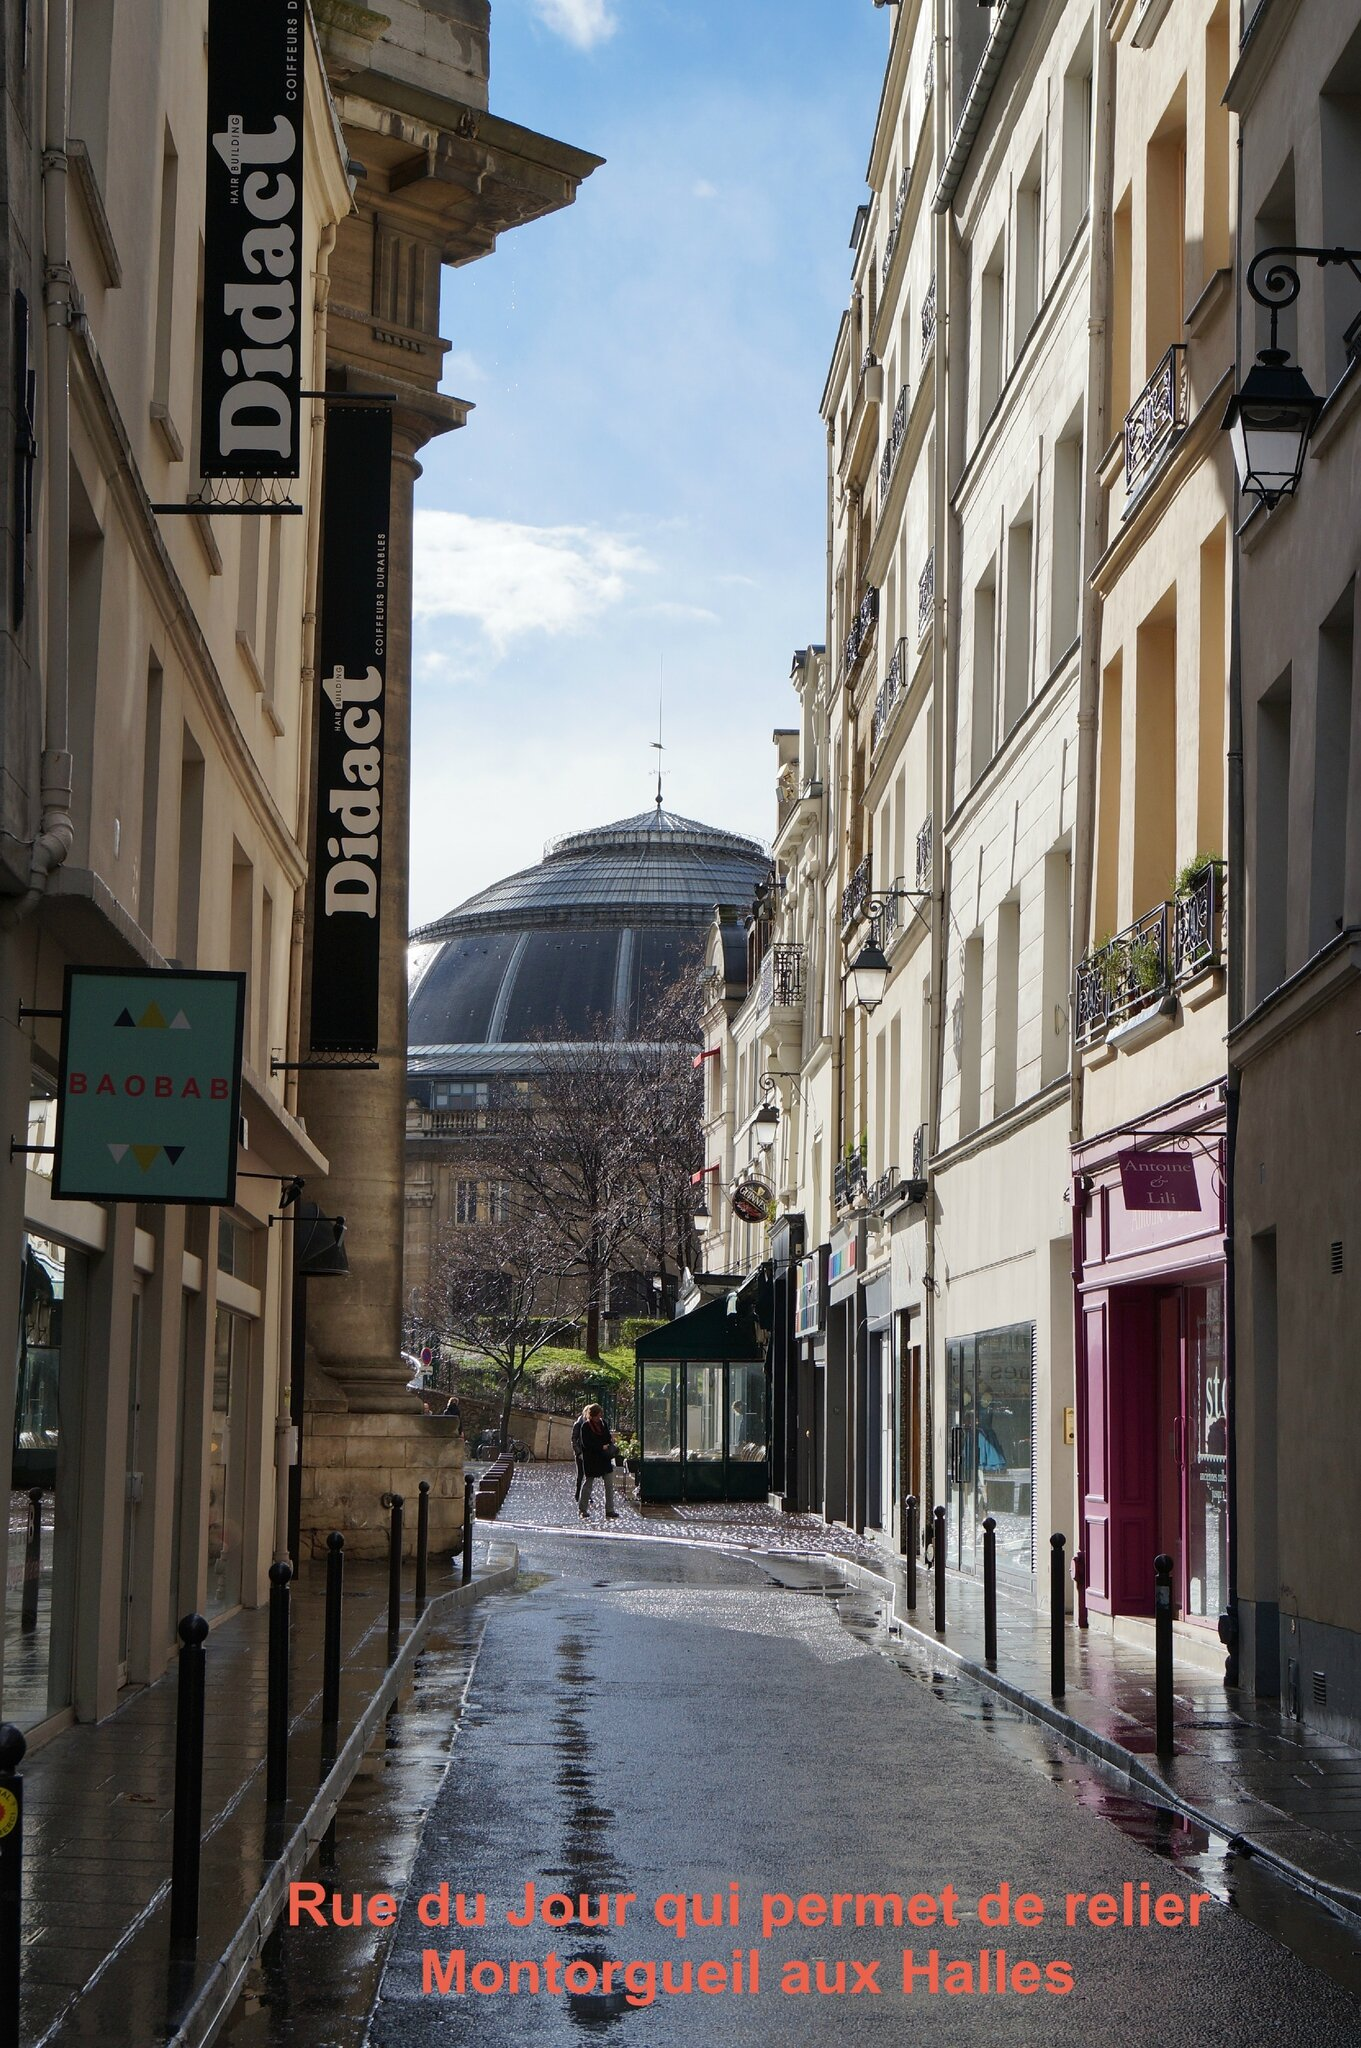 Mora Paris Er Boutique Dustensiles De Cuisine Dans La Cuisine - Ustensiles de cuisine paris